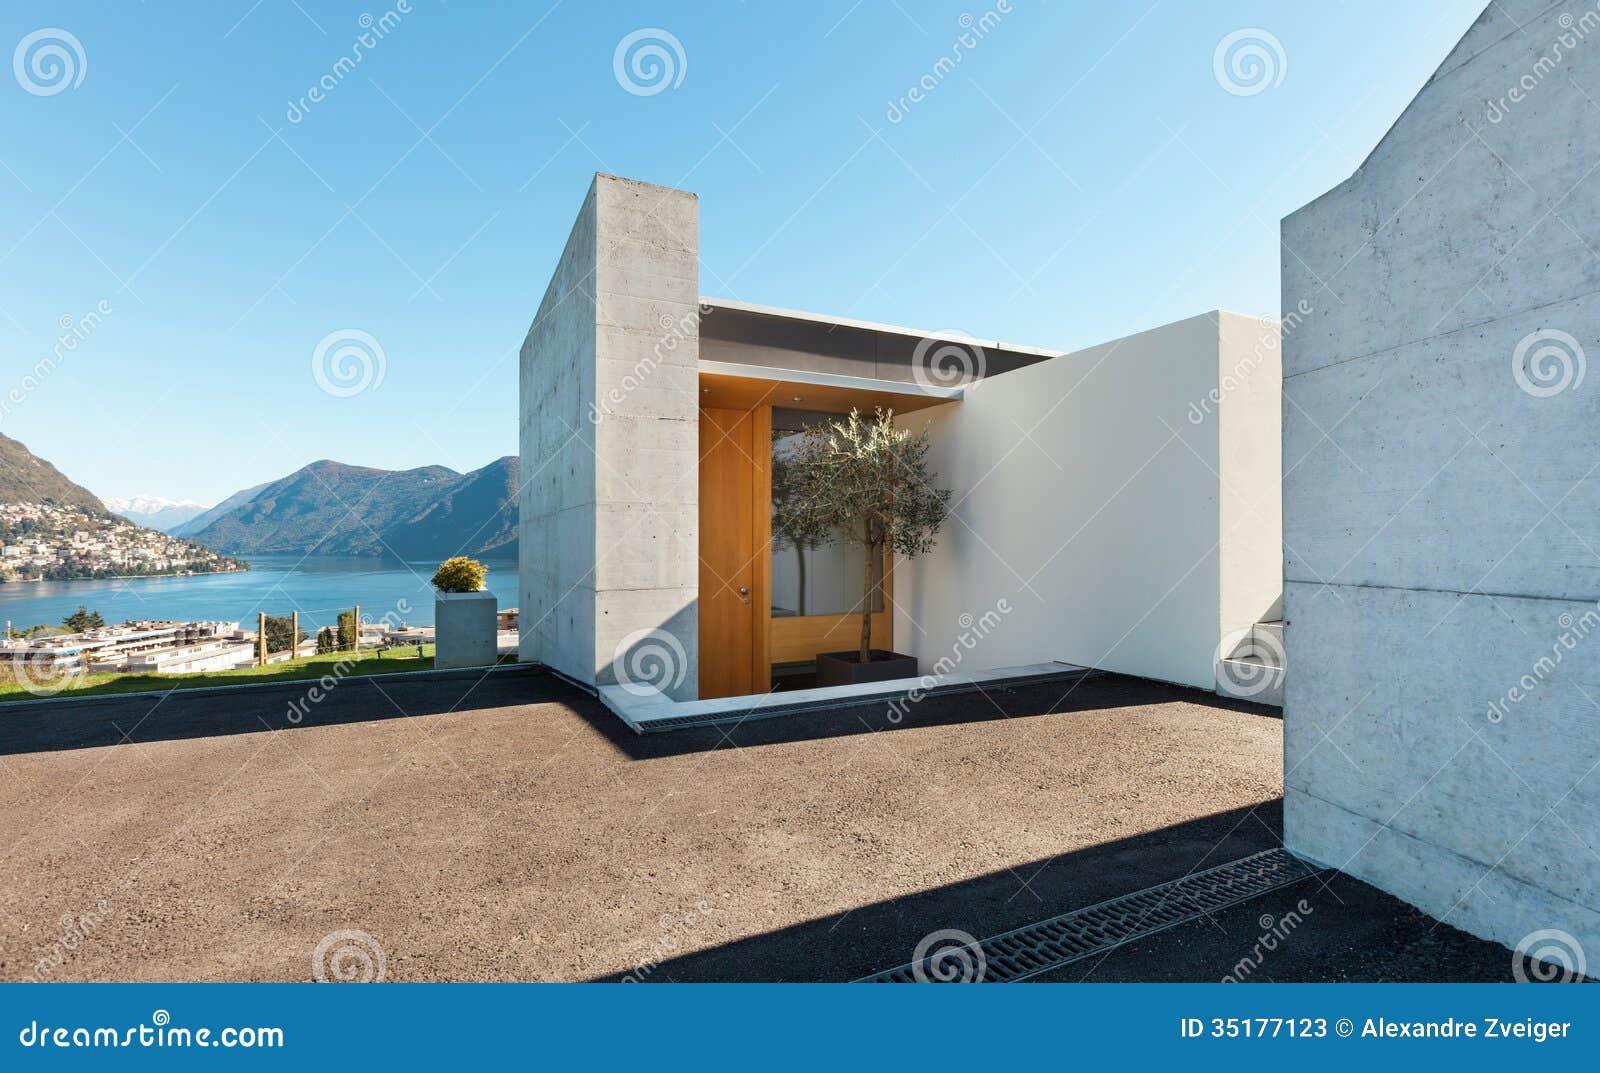 Cement entry house modern